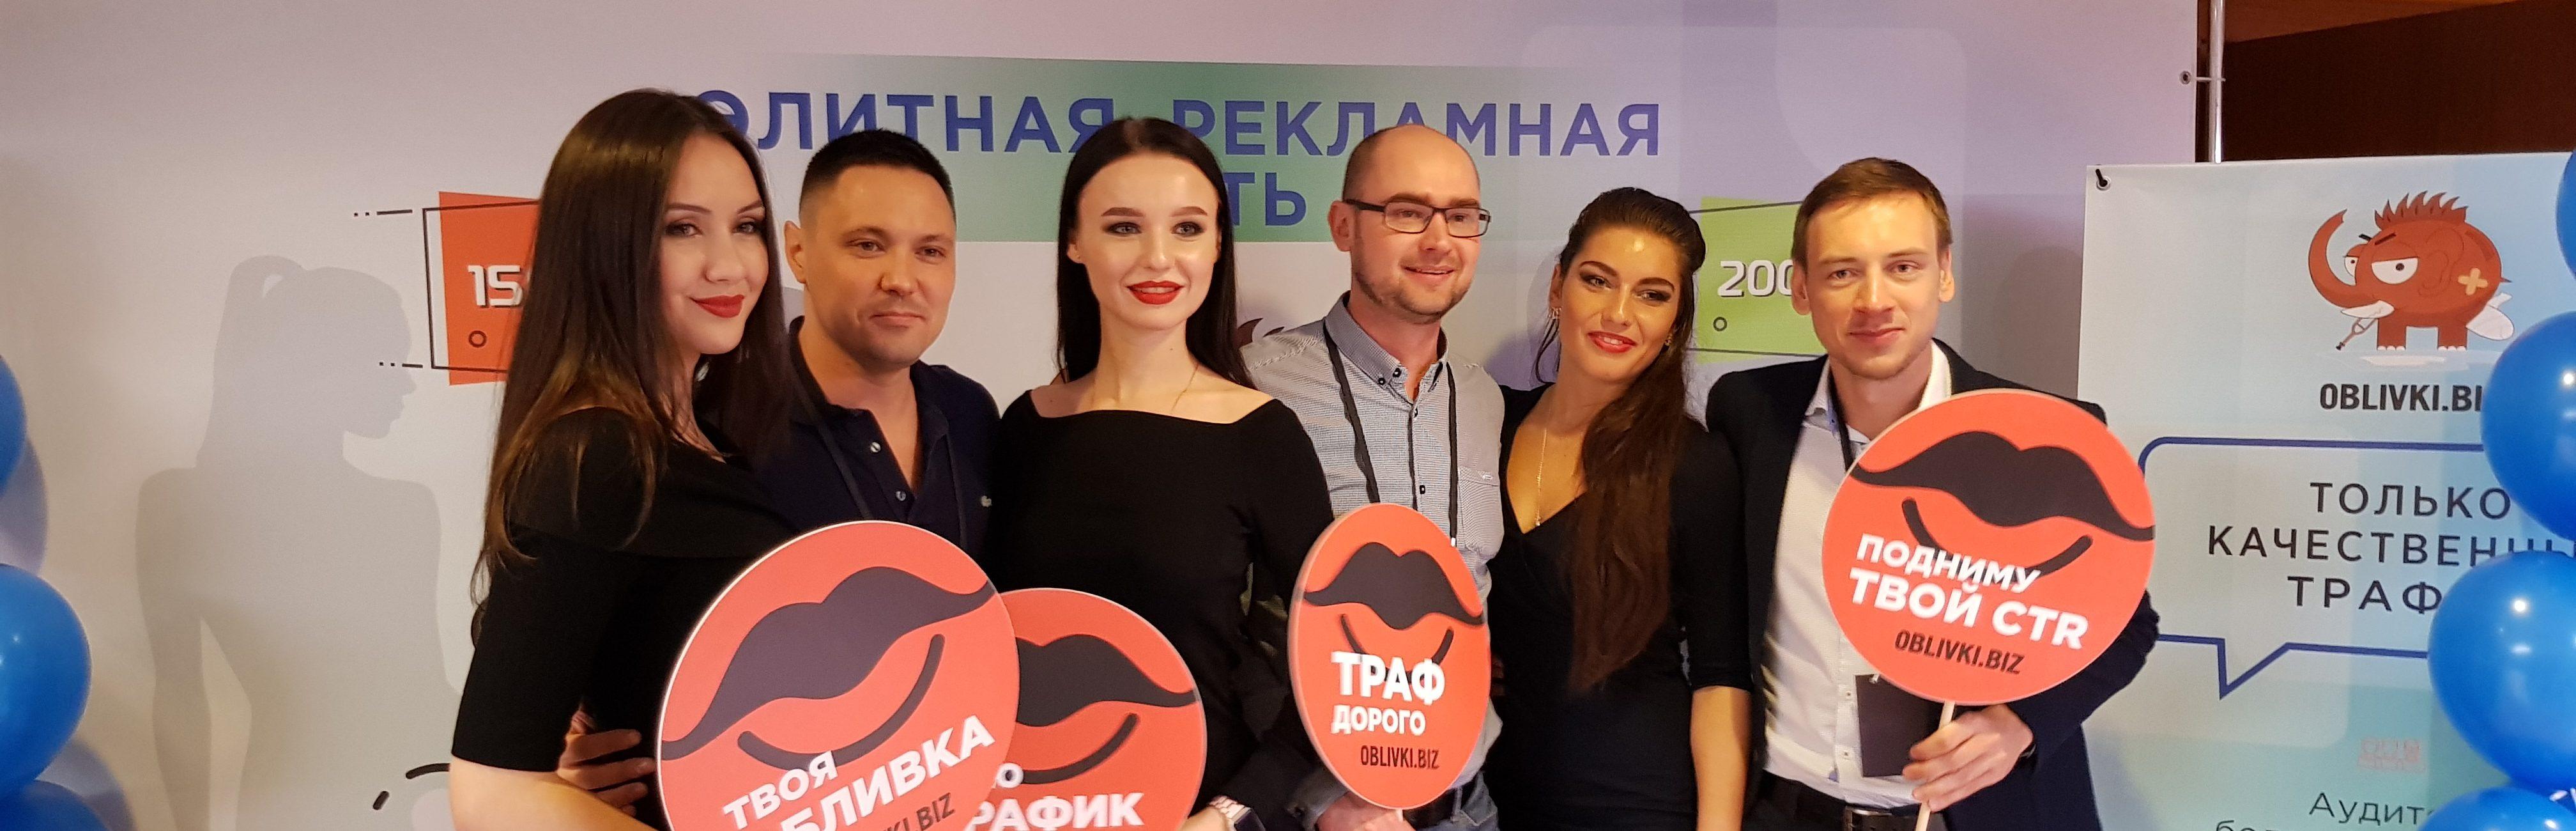 Meetup Traffic Cardinal в Санкт-Петербурге